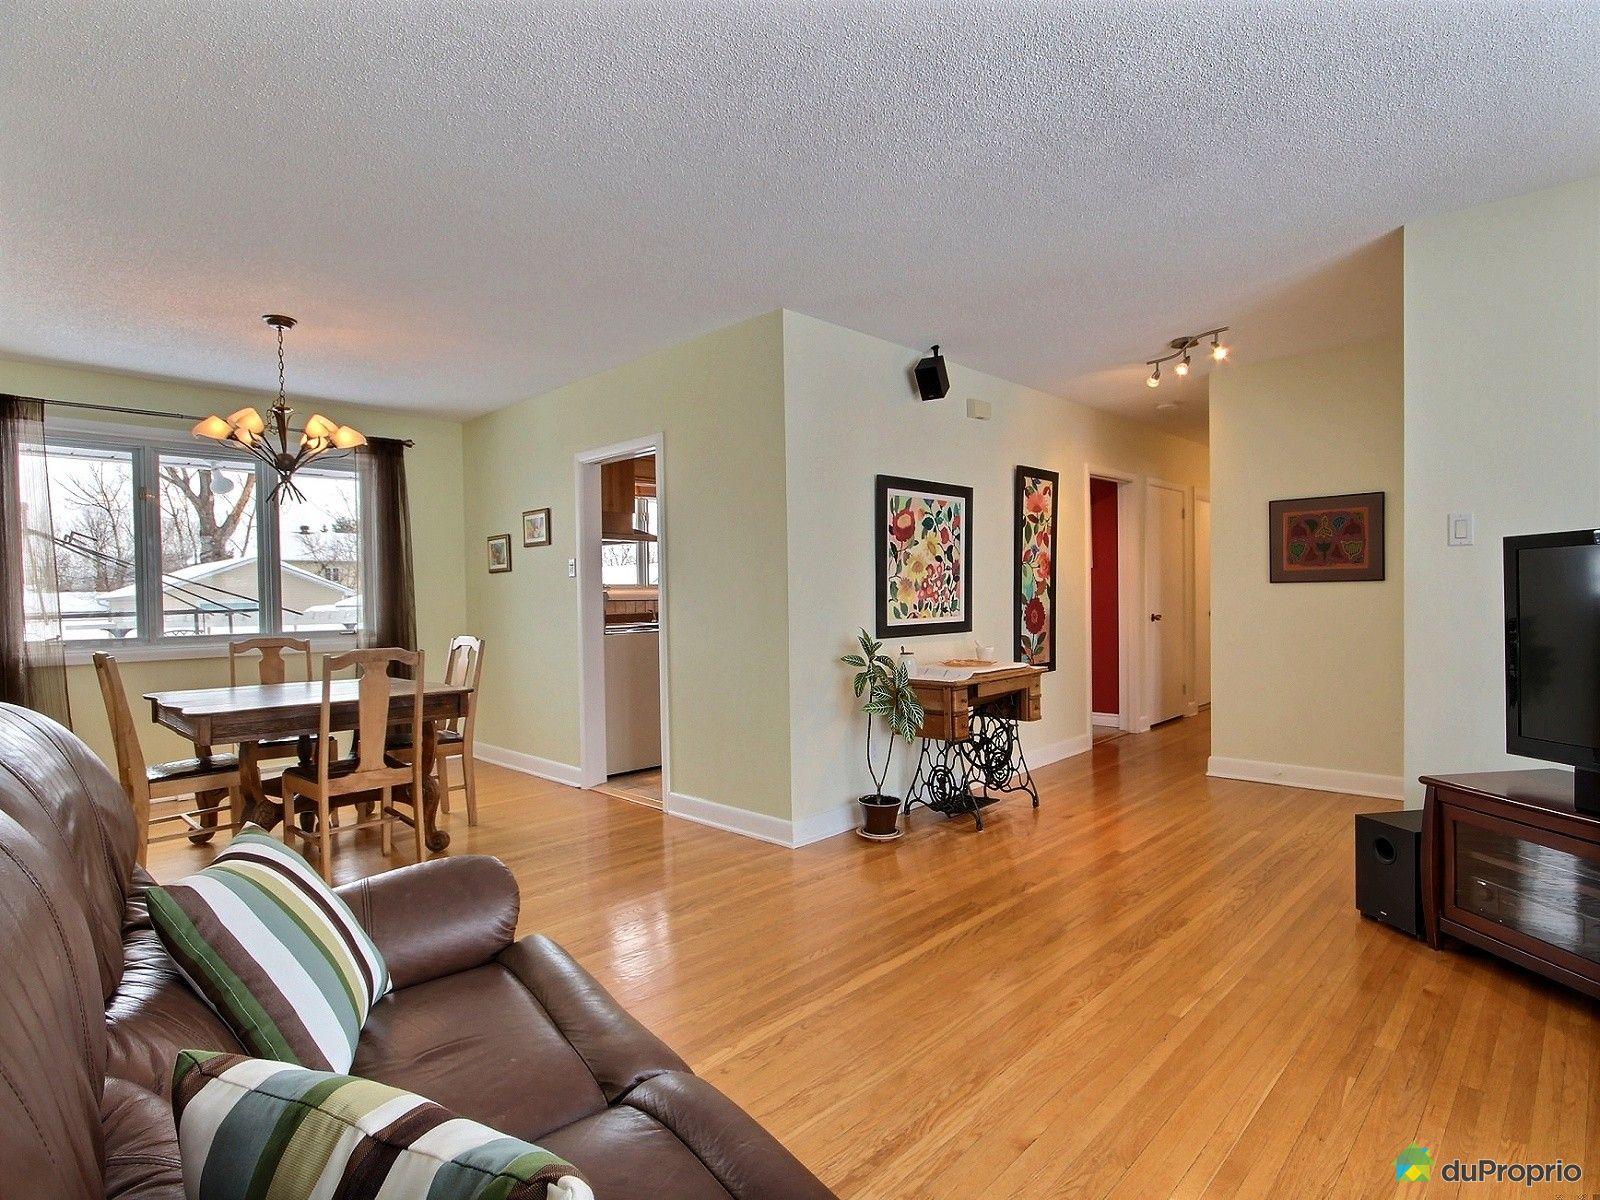 Maison vendre gatineau 7 rue marie bernard immobilier for Salon du cul